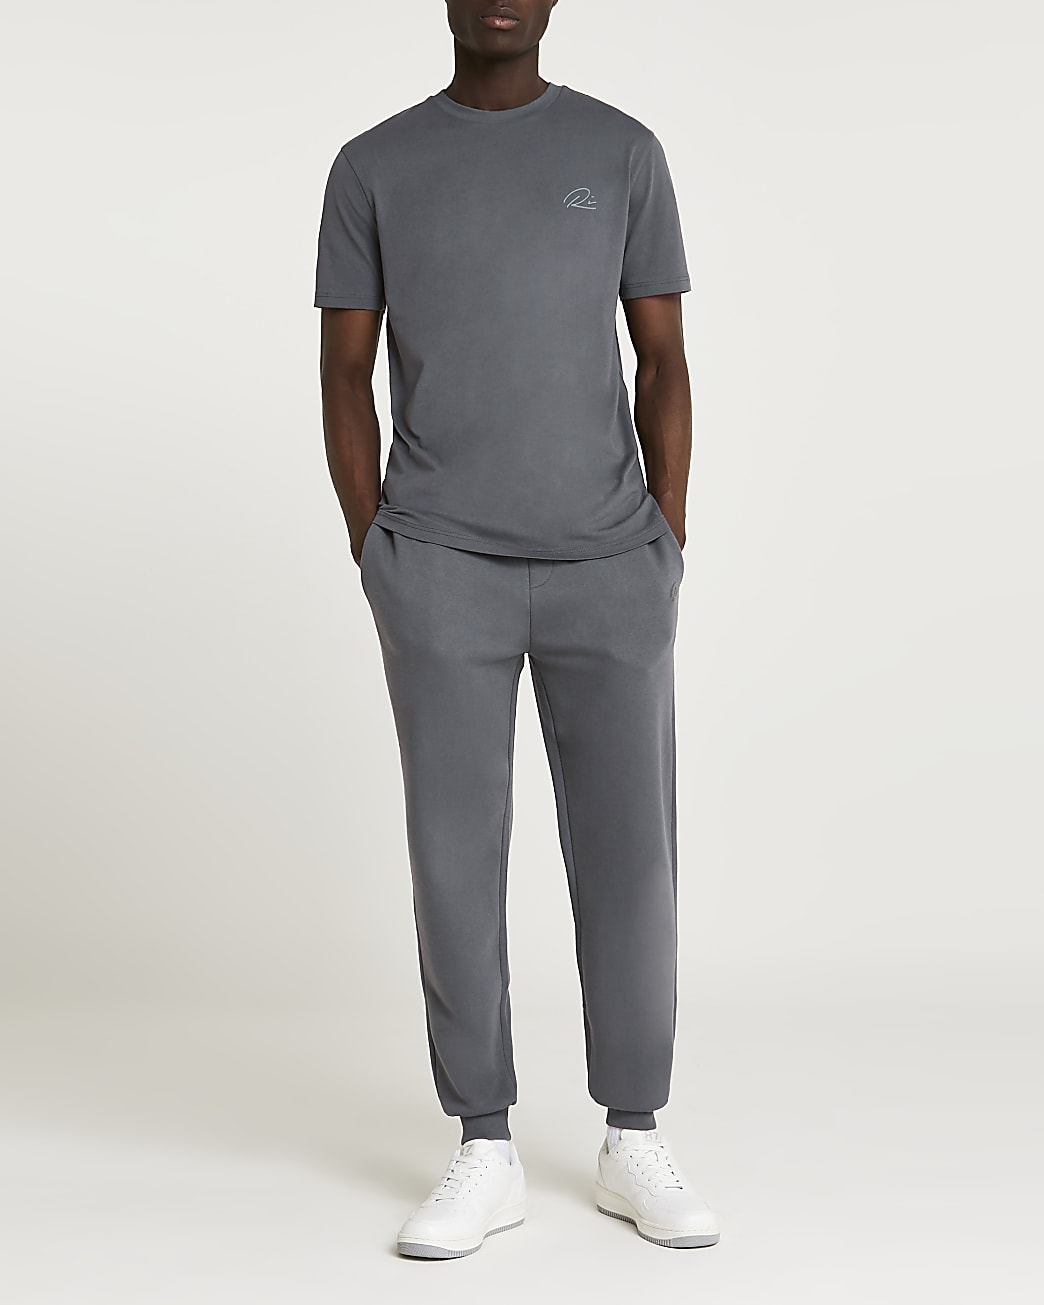 Grey RI slim fit t-shirt and joggers set